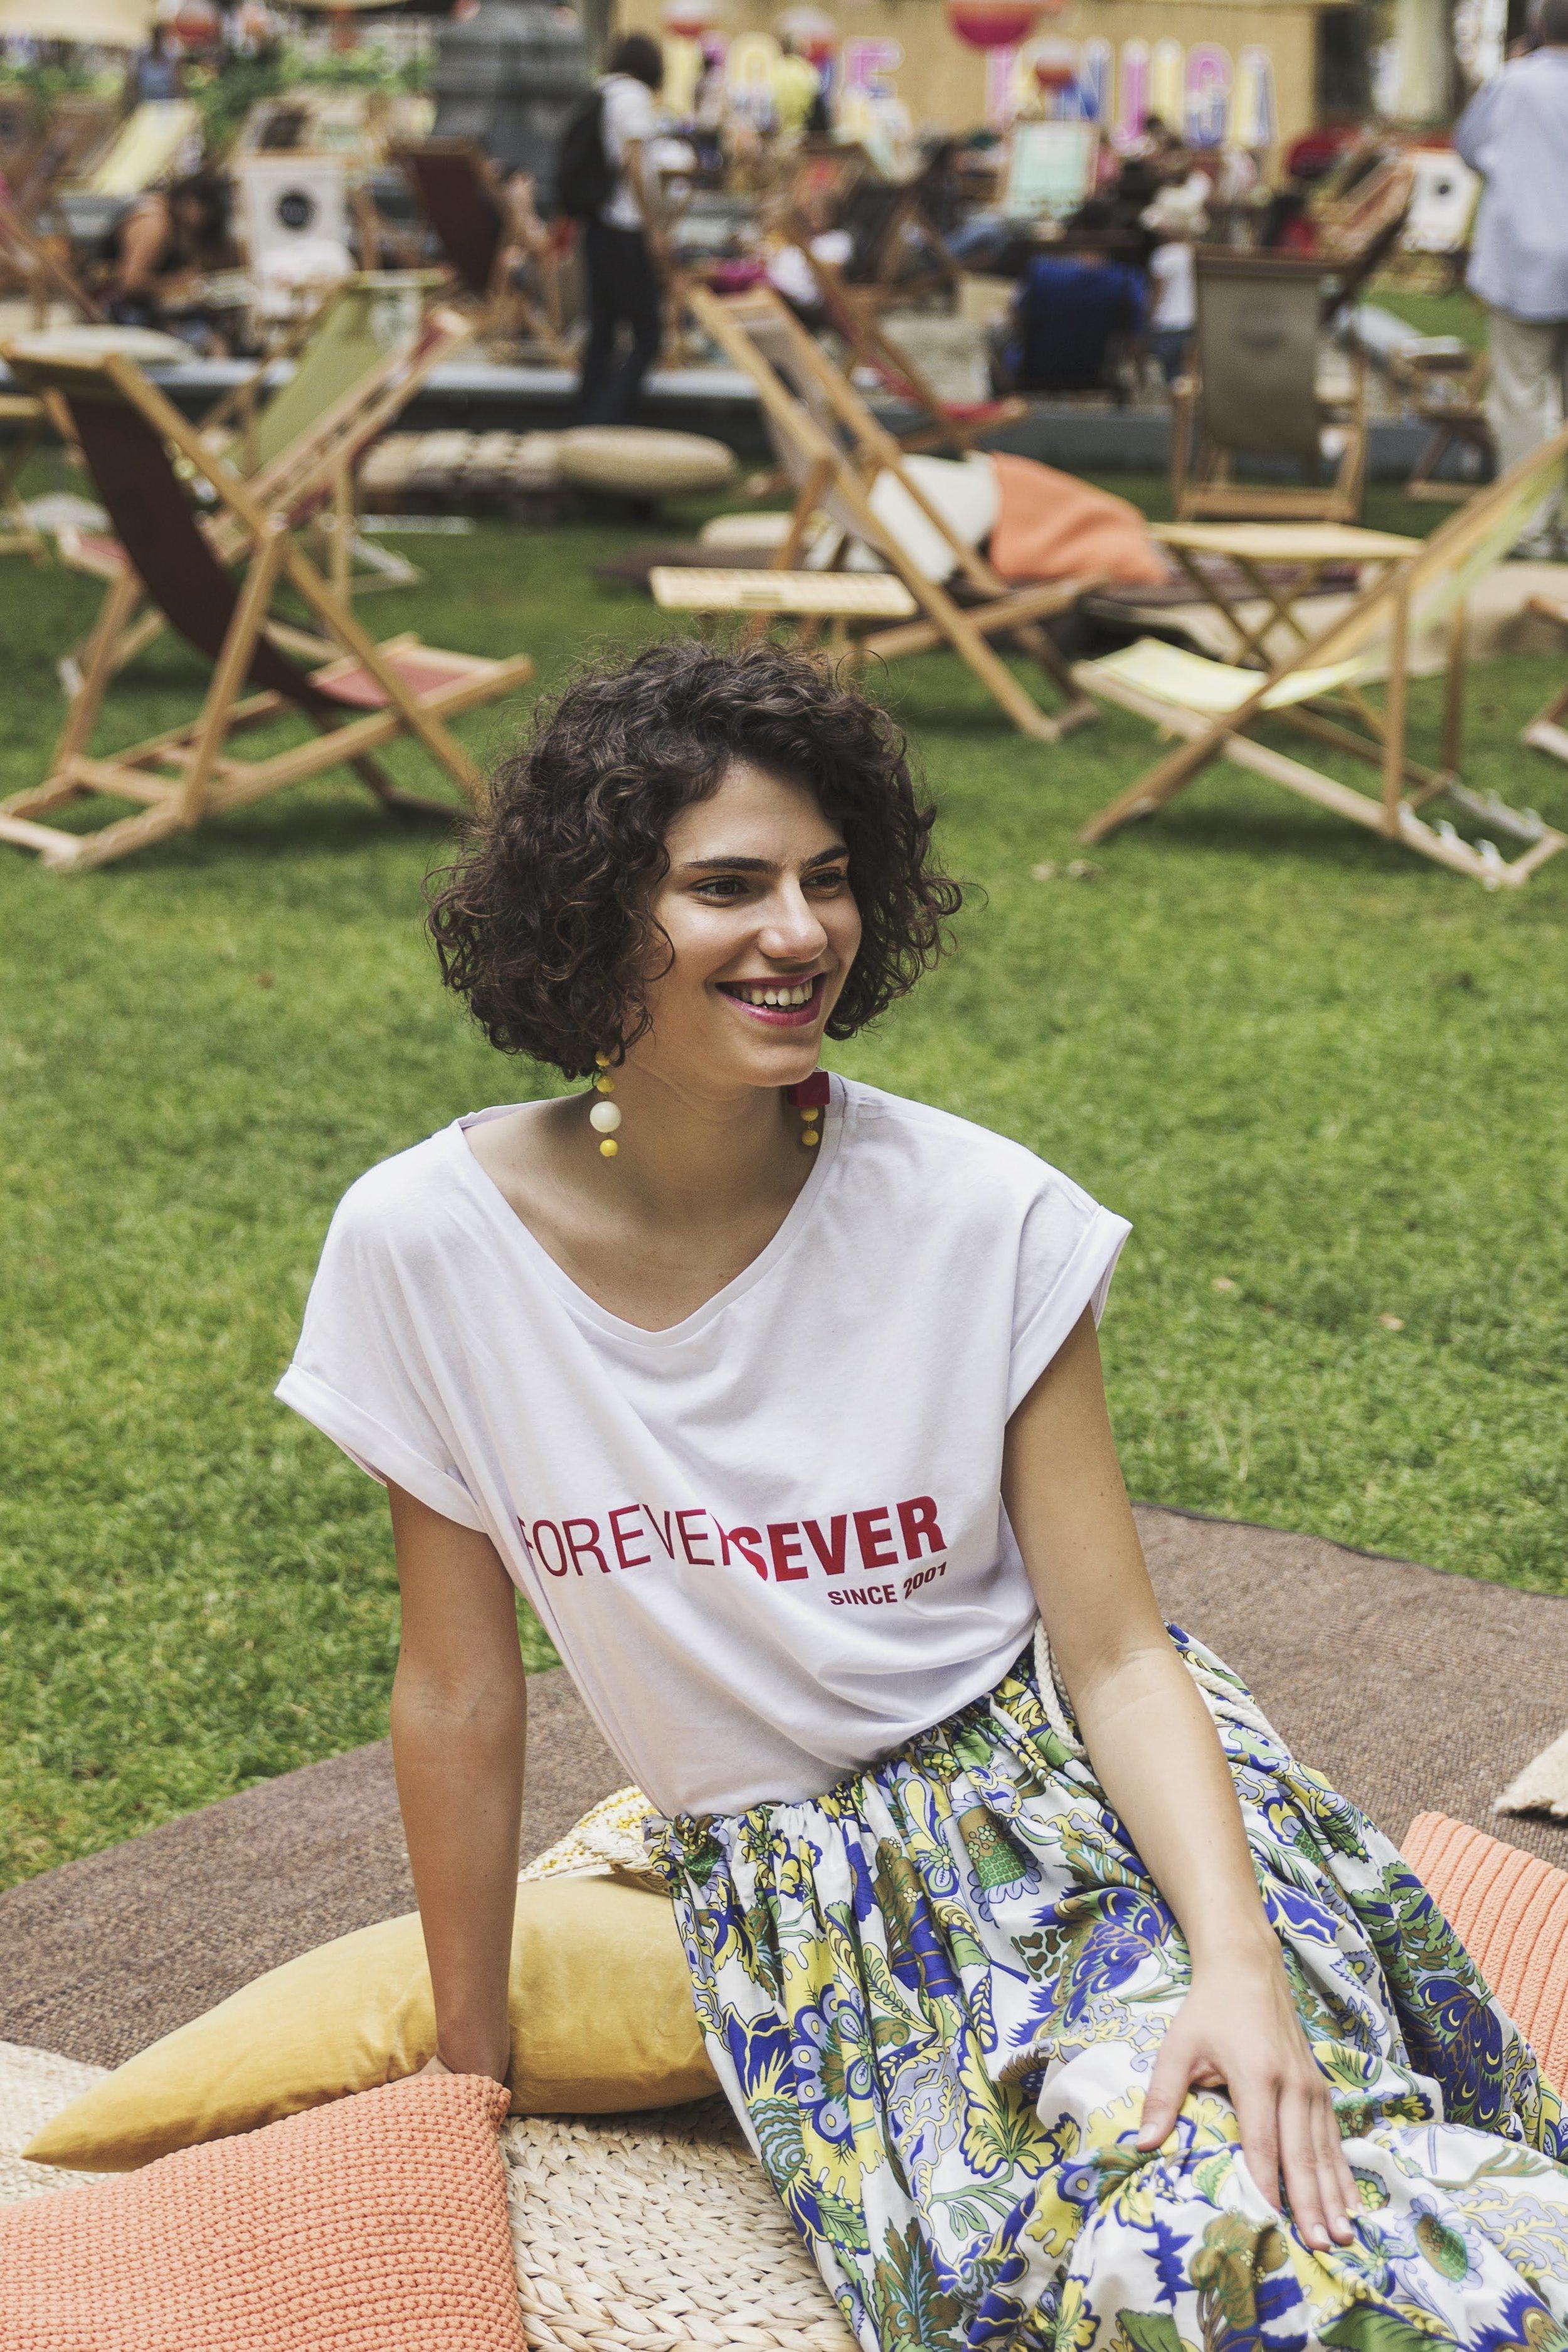 luka-lajic-fashion-photography-robert-sever-dizajner-croatian (20).jpg